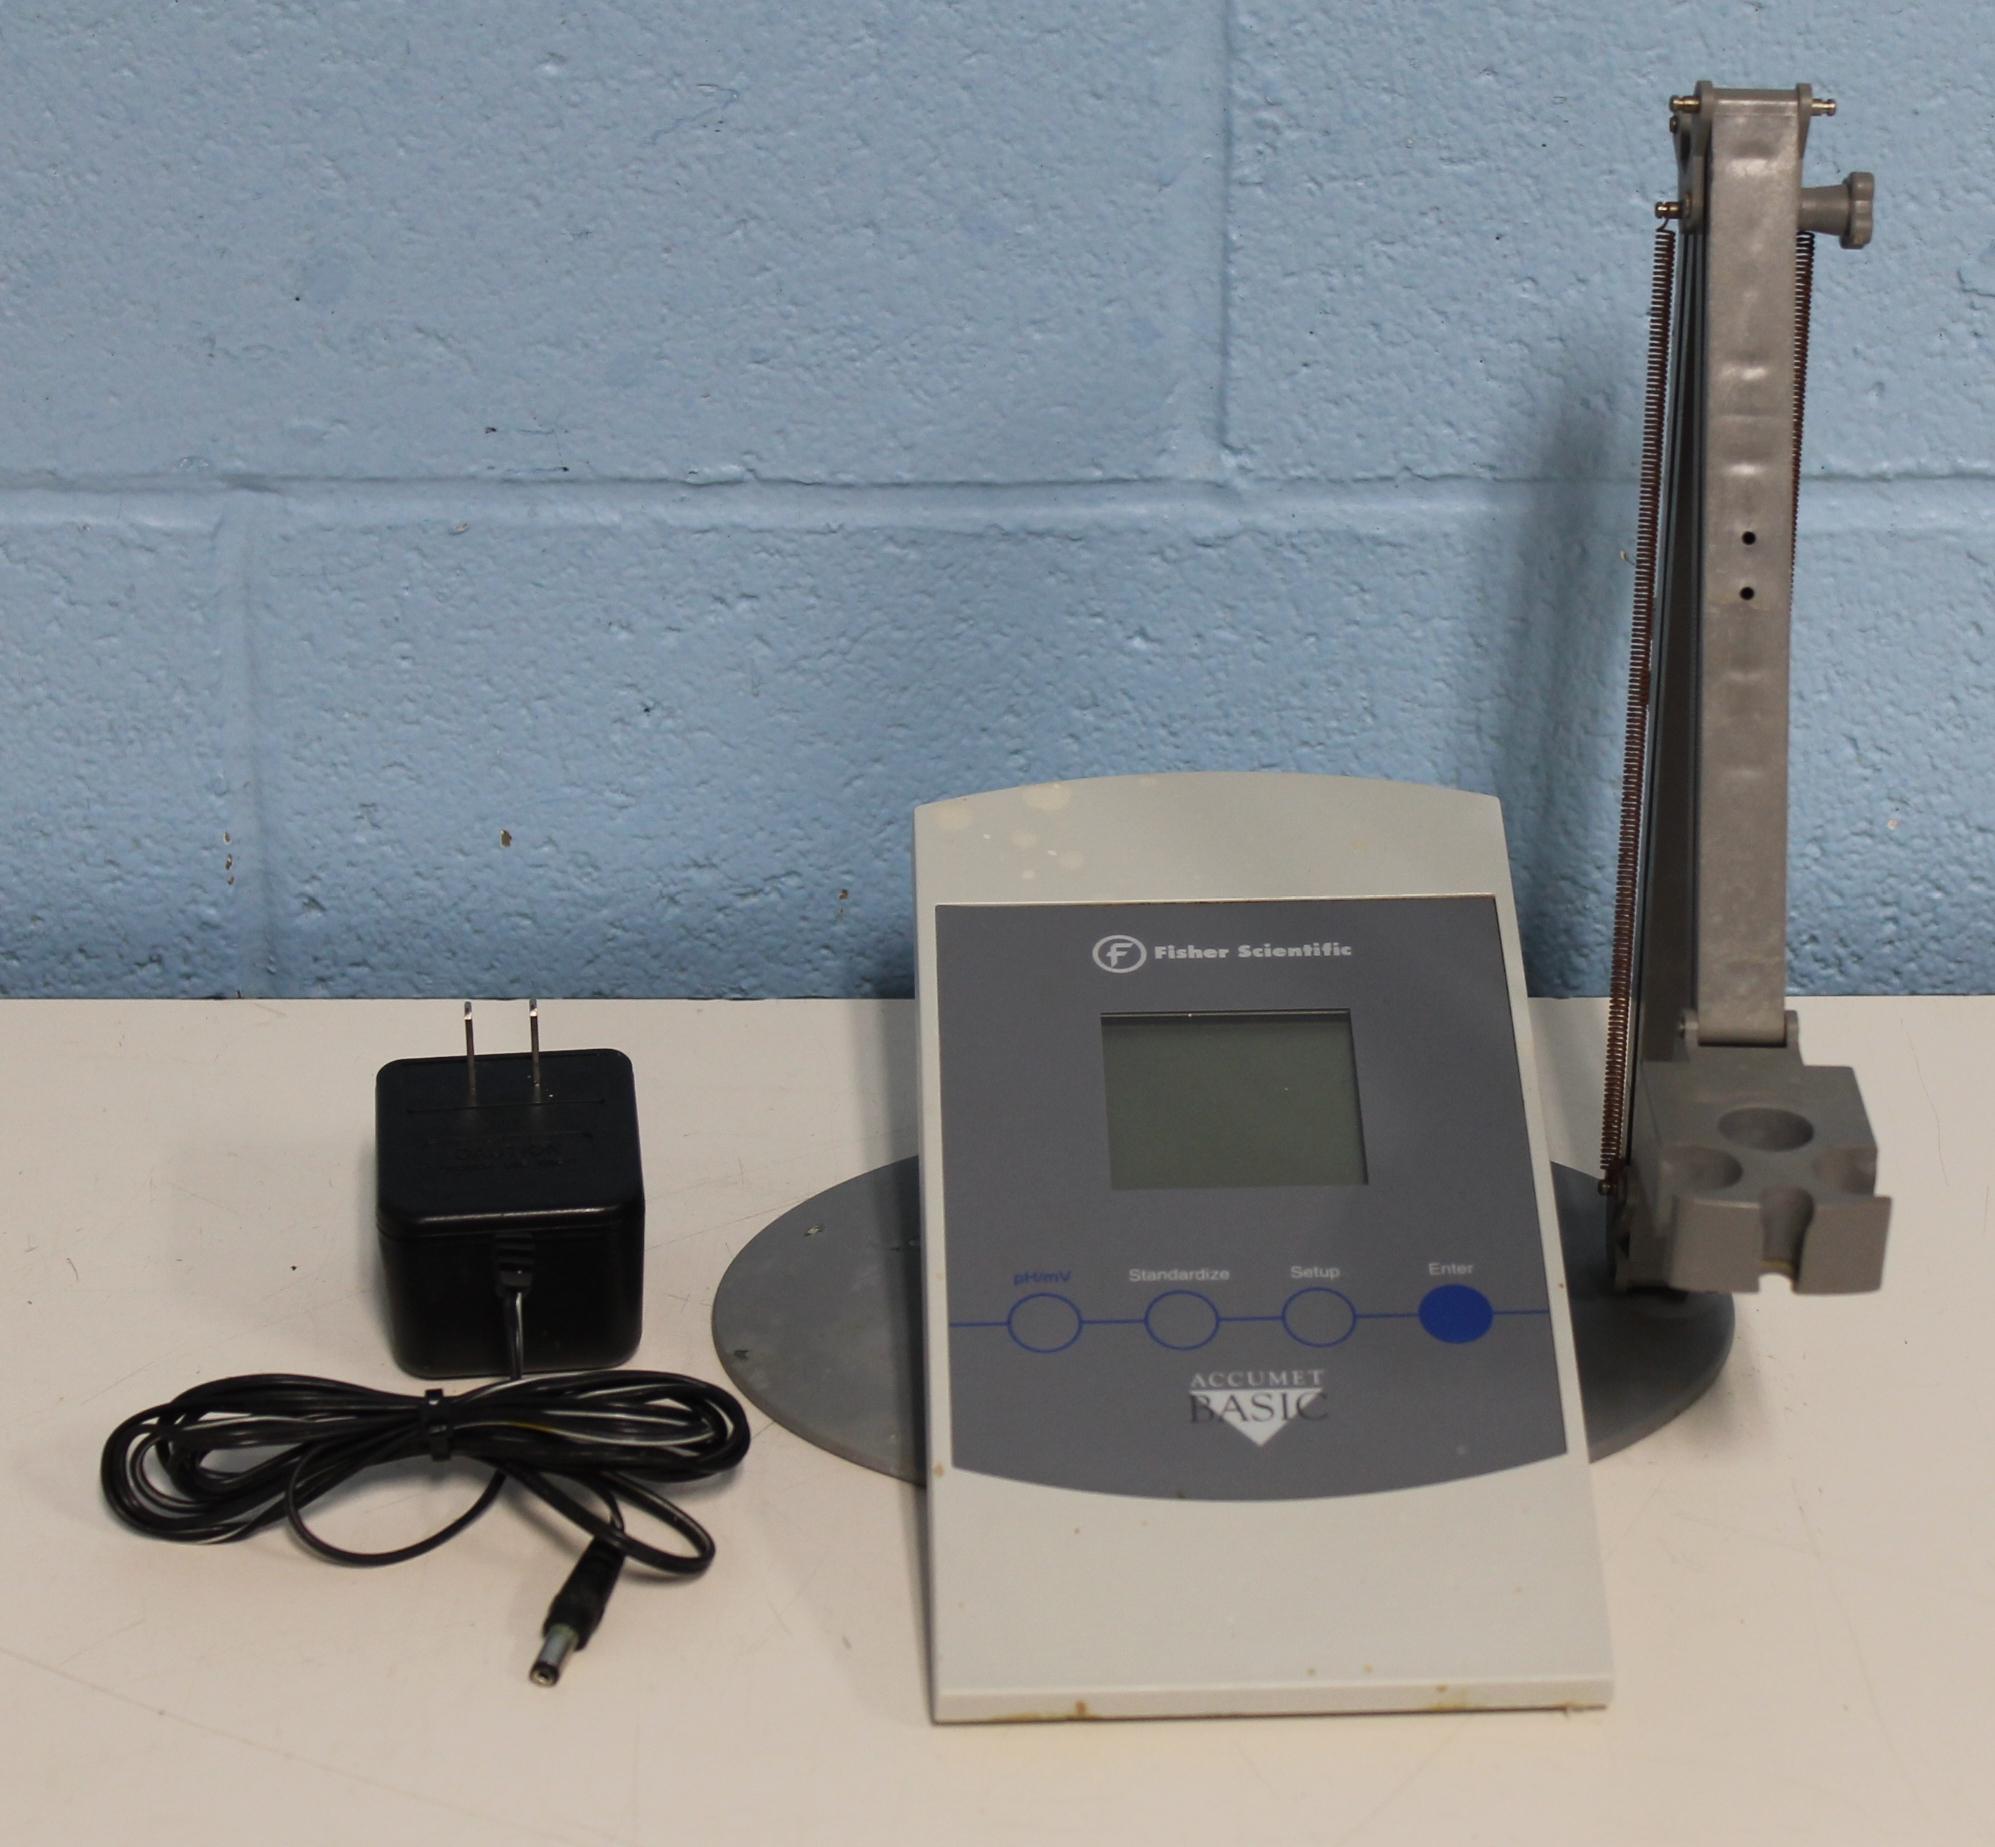 Ph Meter For Chemicals : Refurbished fisher scientific accumet basic ph meter